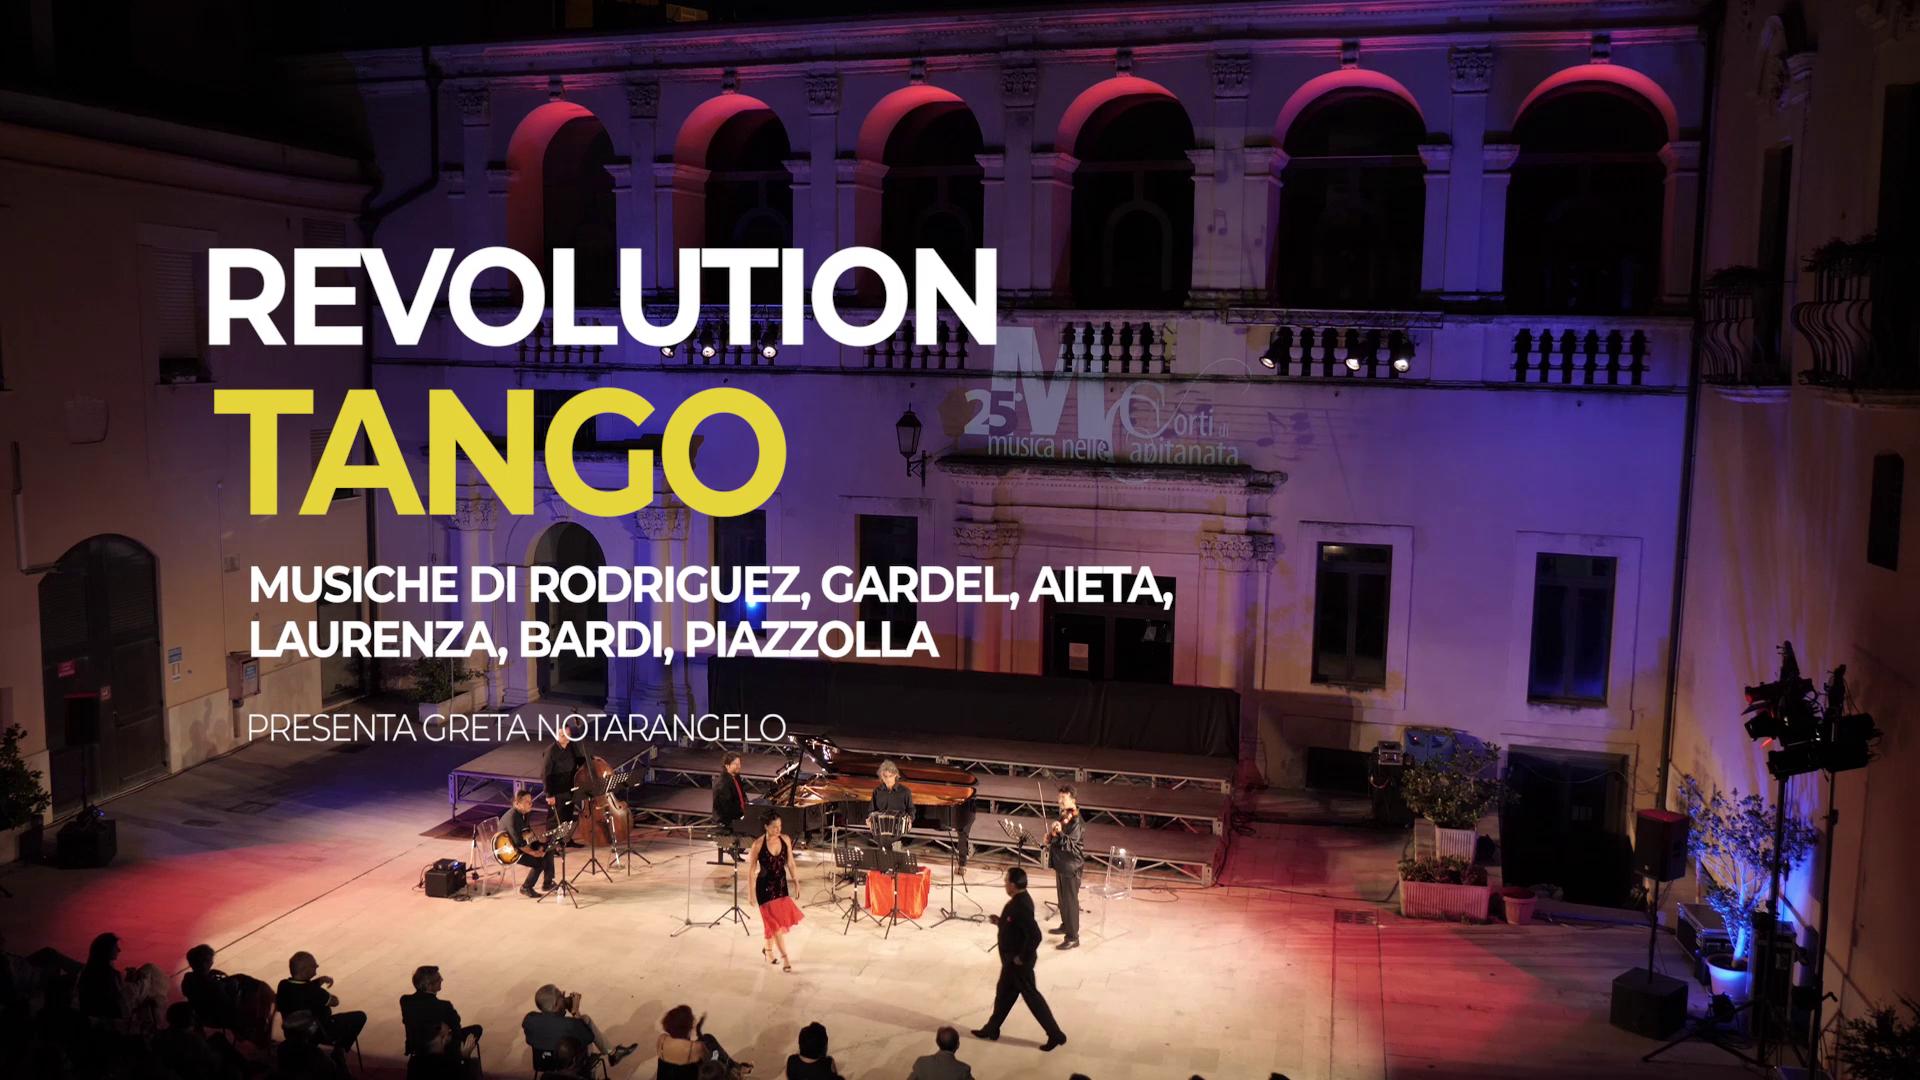 12 -15/07 – REVOLUTION TANGO